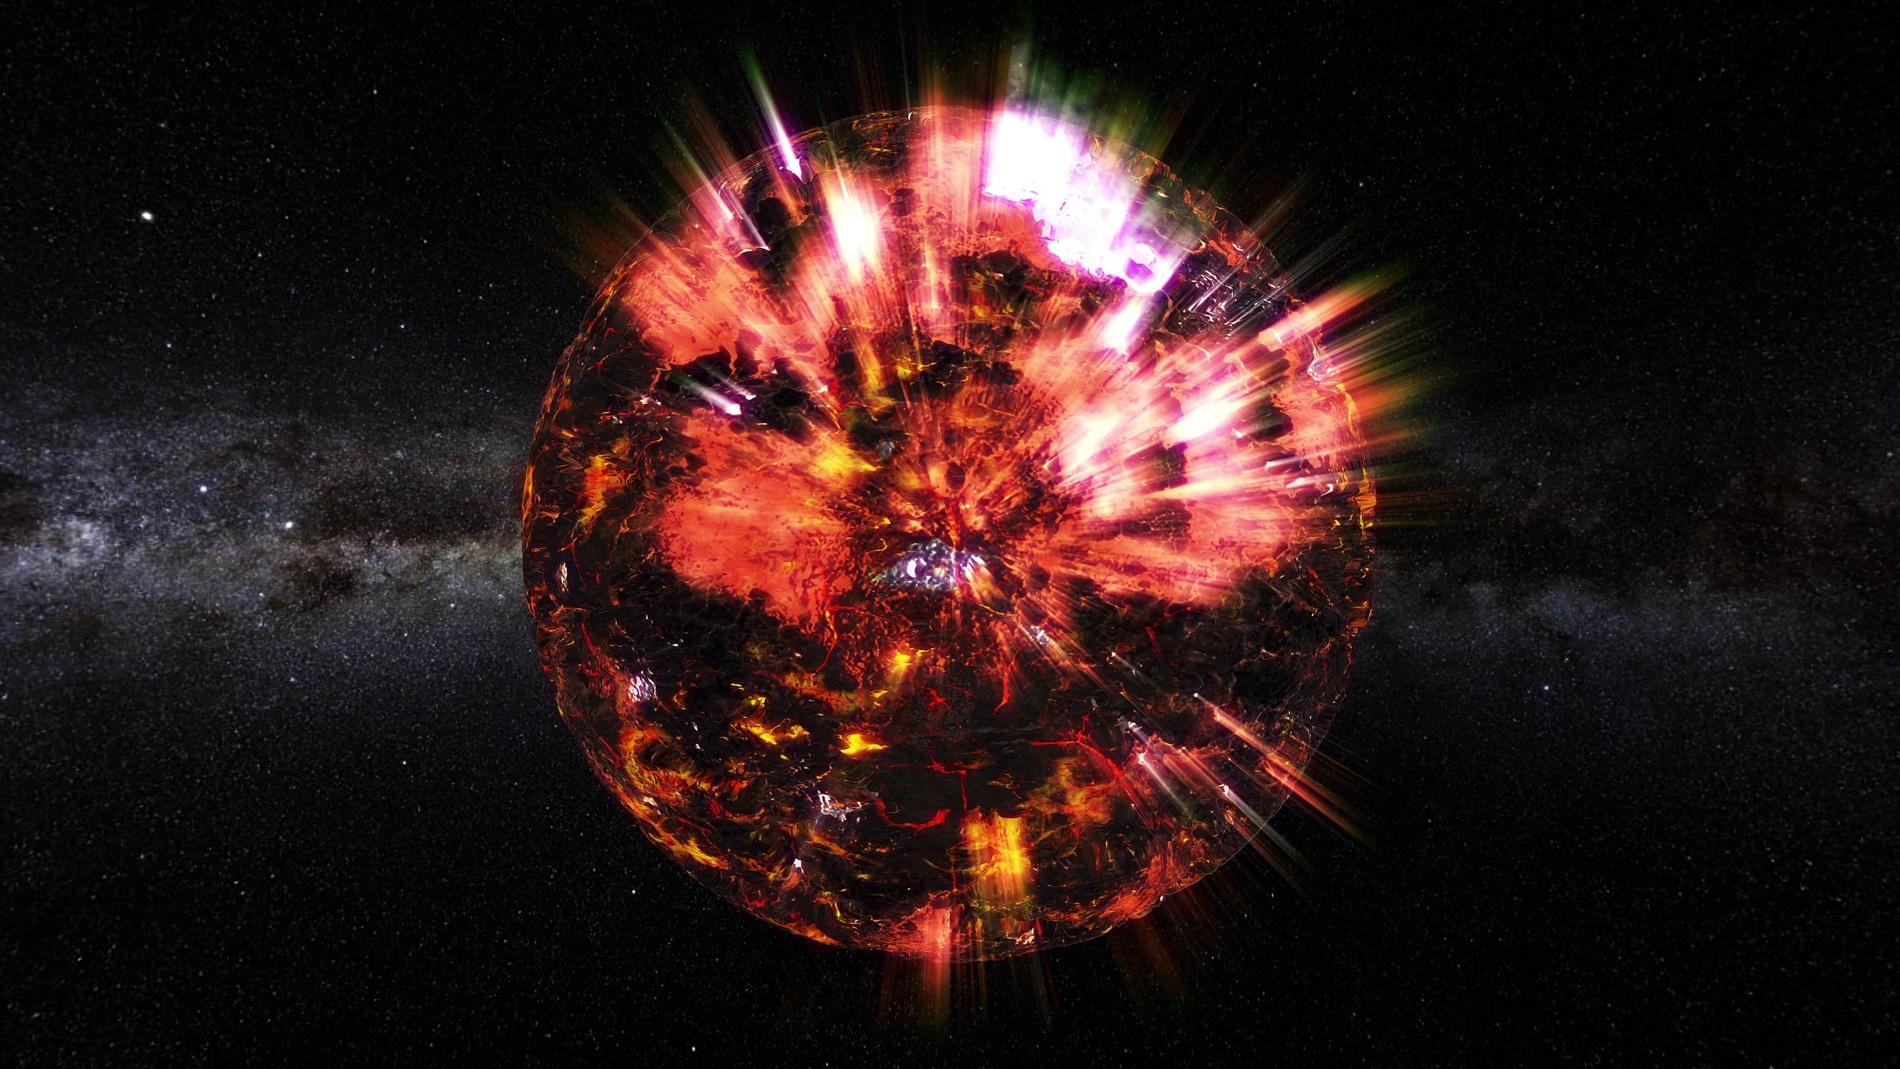 Now-dead radio telescope finds bizarre venomous-spider star thumbnail